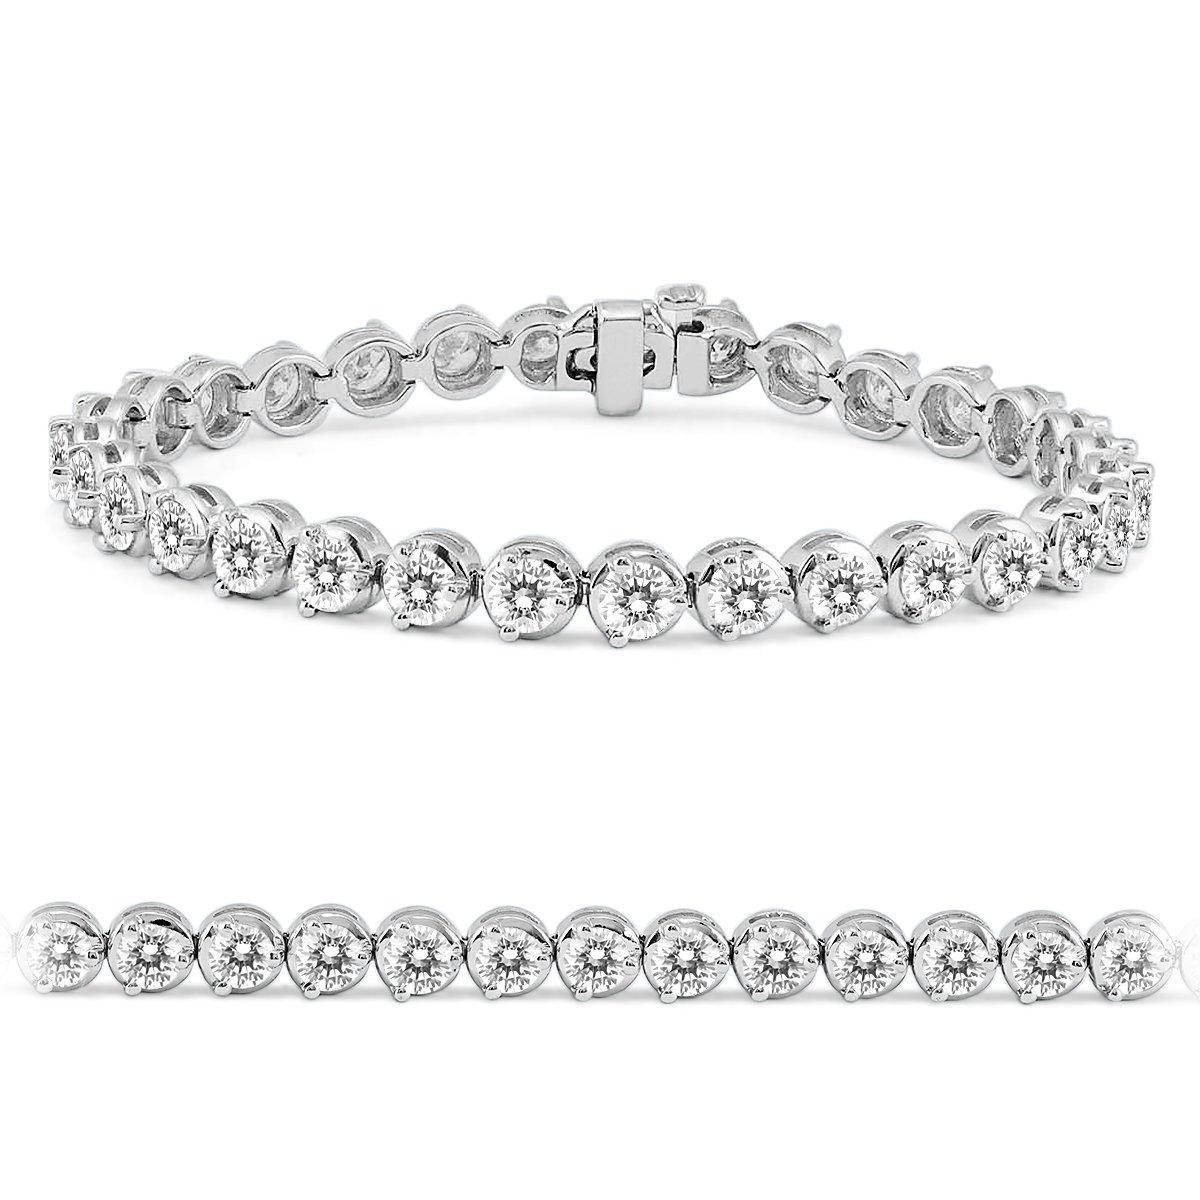 AGS Certified 10 Carat TW Classic Diamond Tennis Bracelet in 14K White Gold